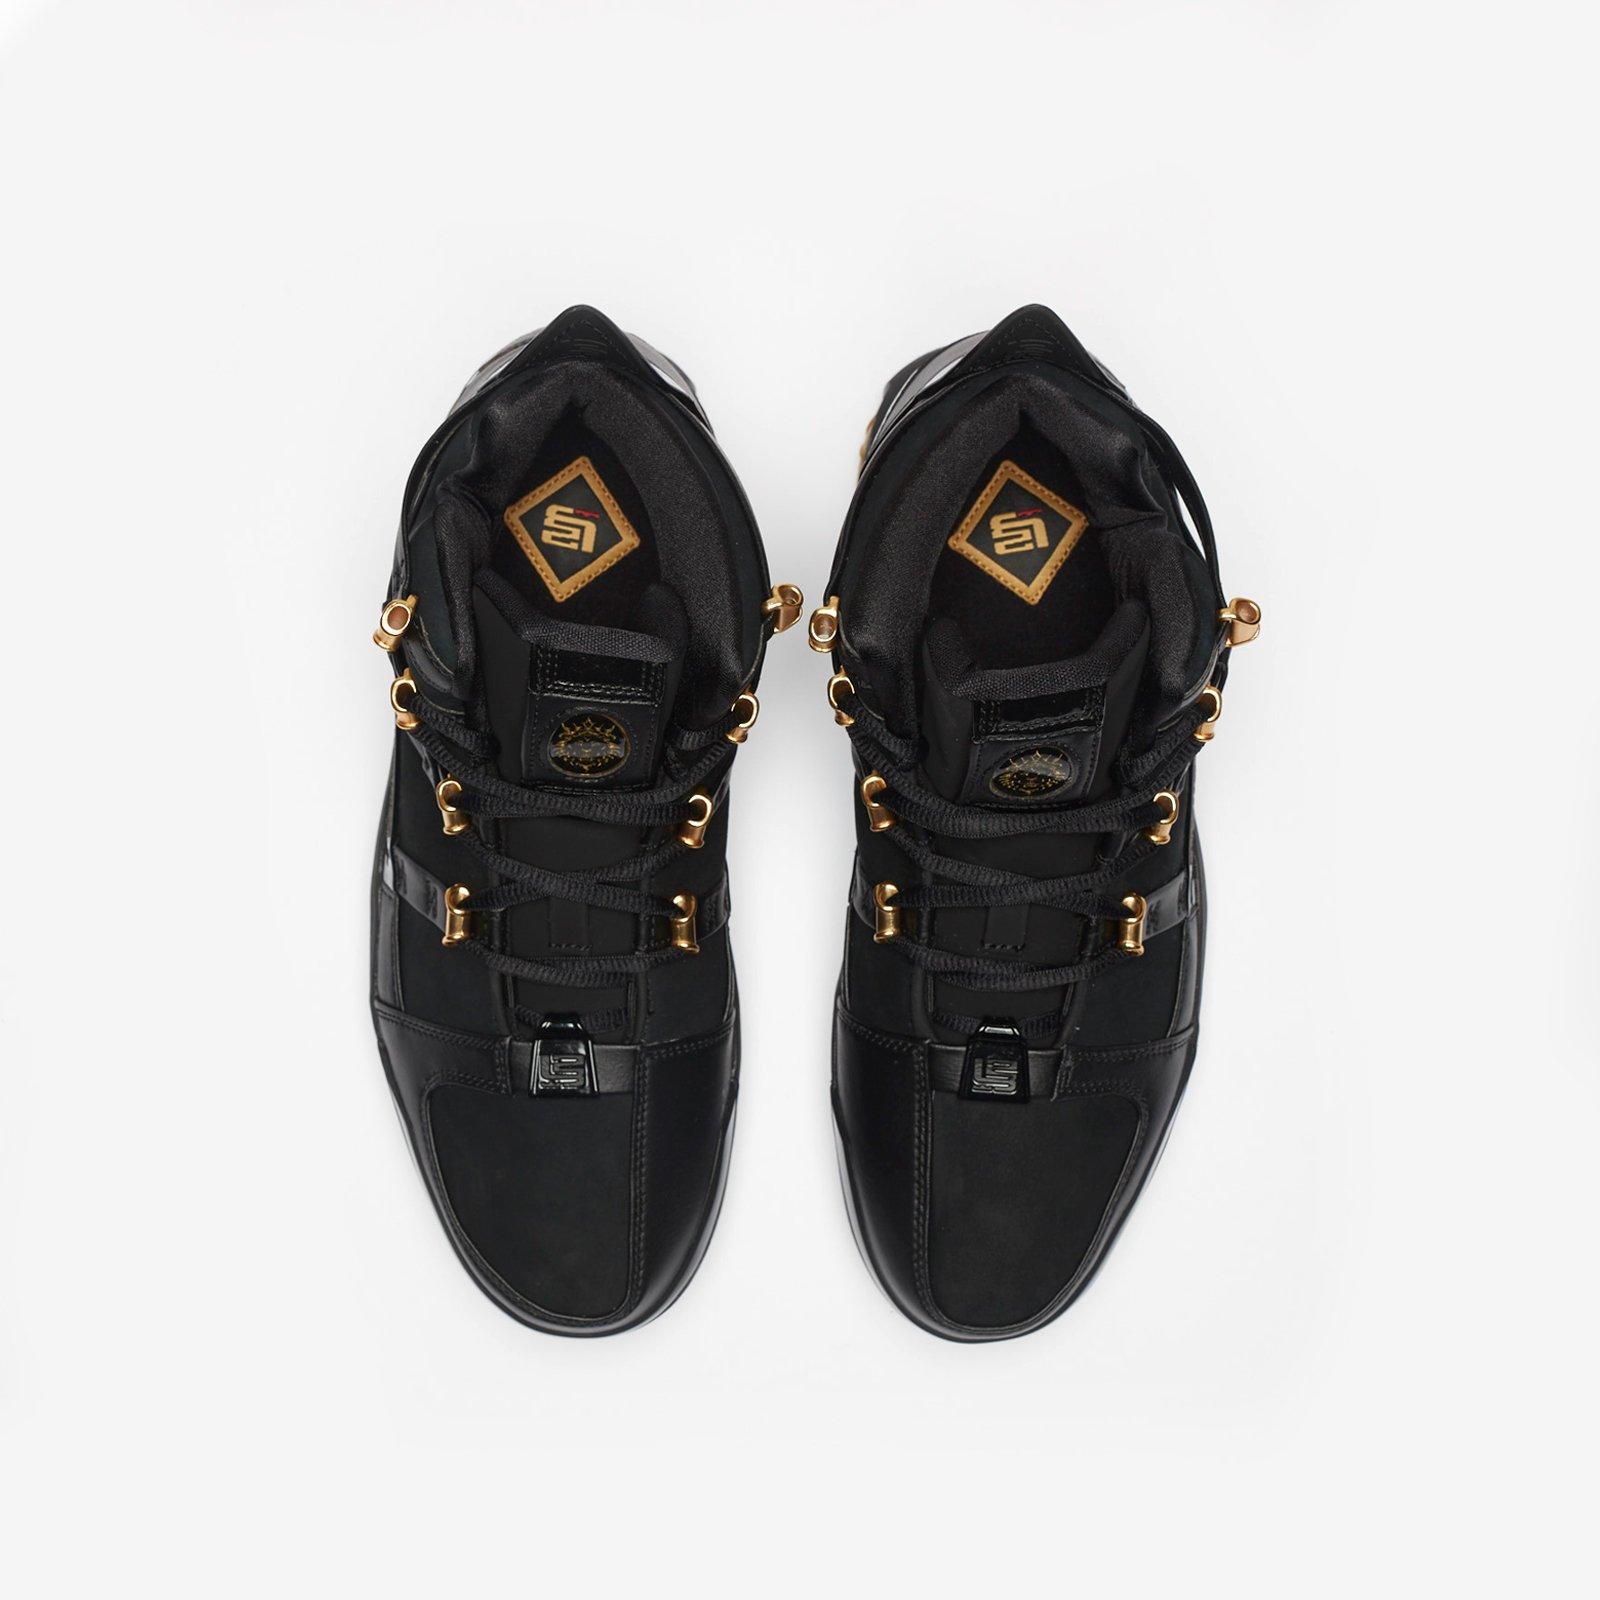 c20a93f90aa Nike Zoom LeBron III QS - Ao2434-001 - Sneakersnstuff